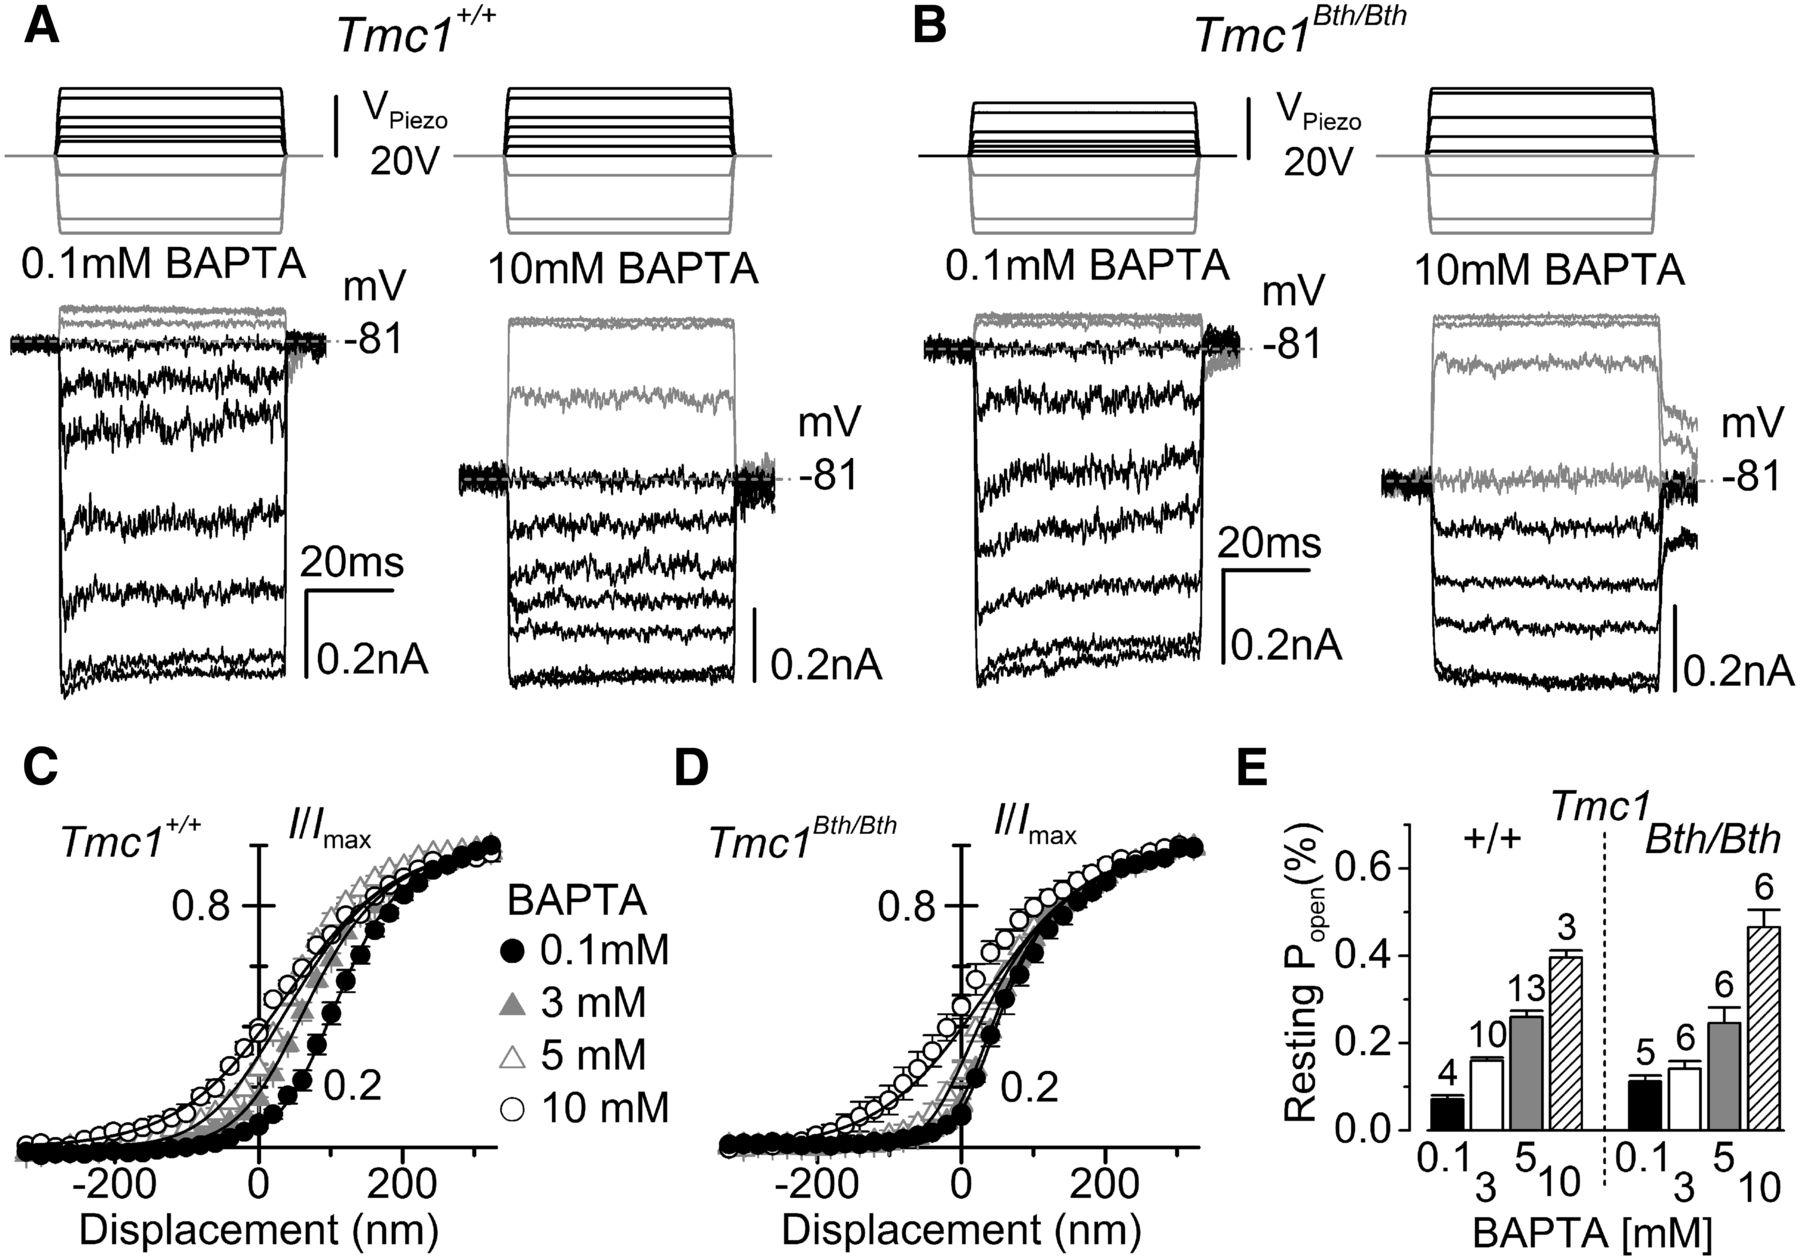 Tmc1 Point Mutation Affects Ca2 Sensitivity And Block By Piezo Driver Amplifier Modulator A303 Download Figure